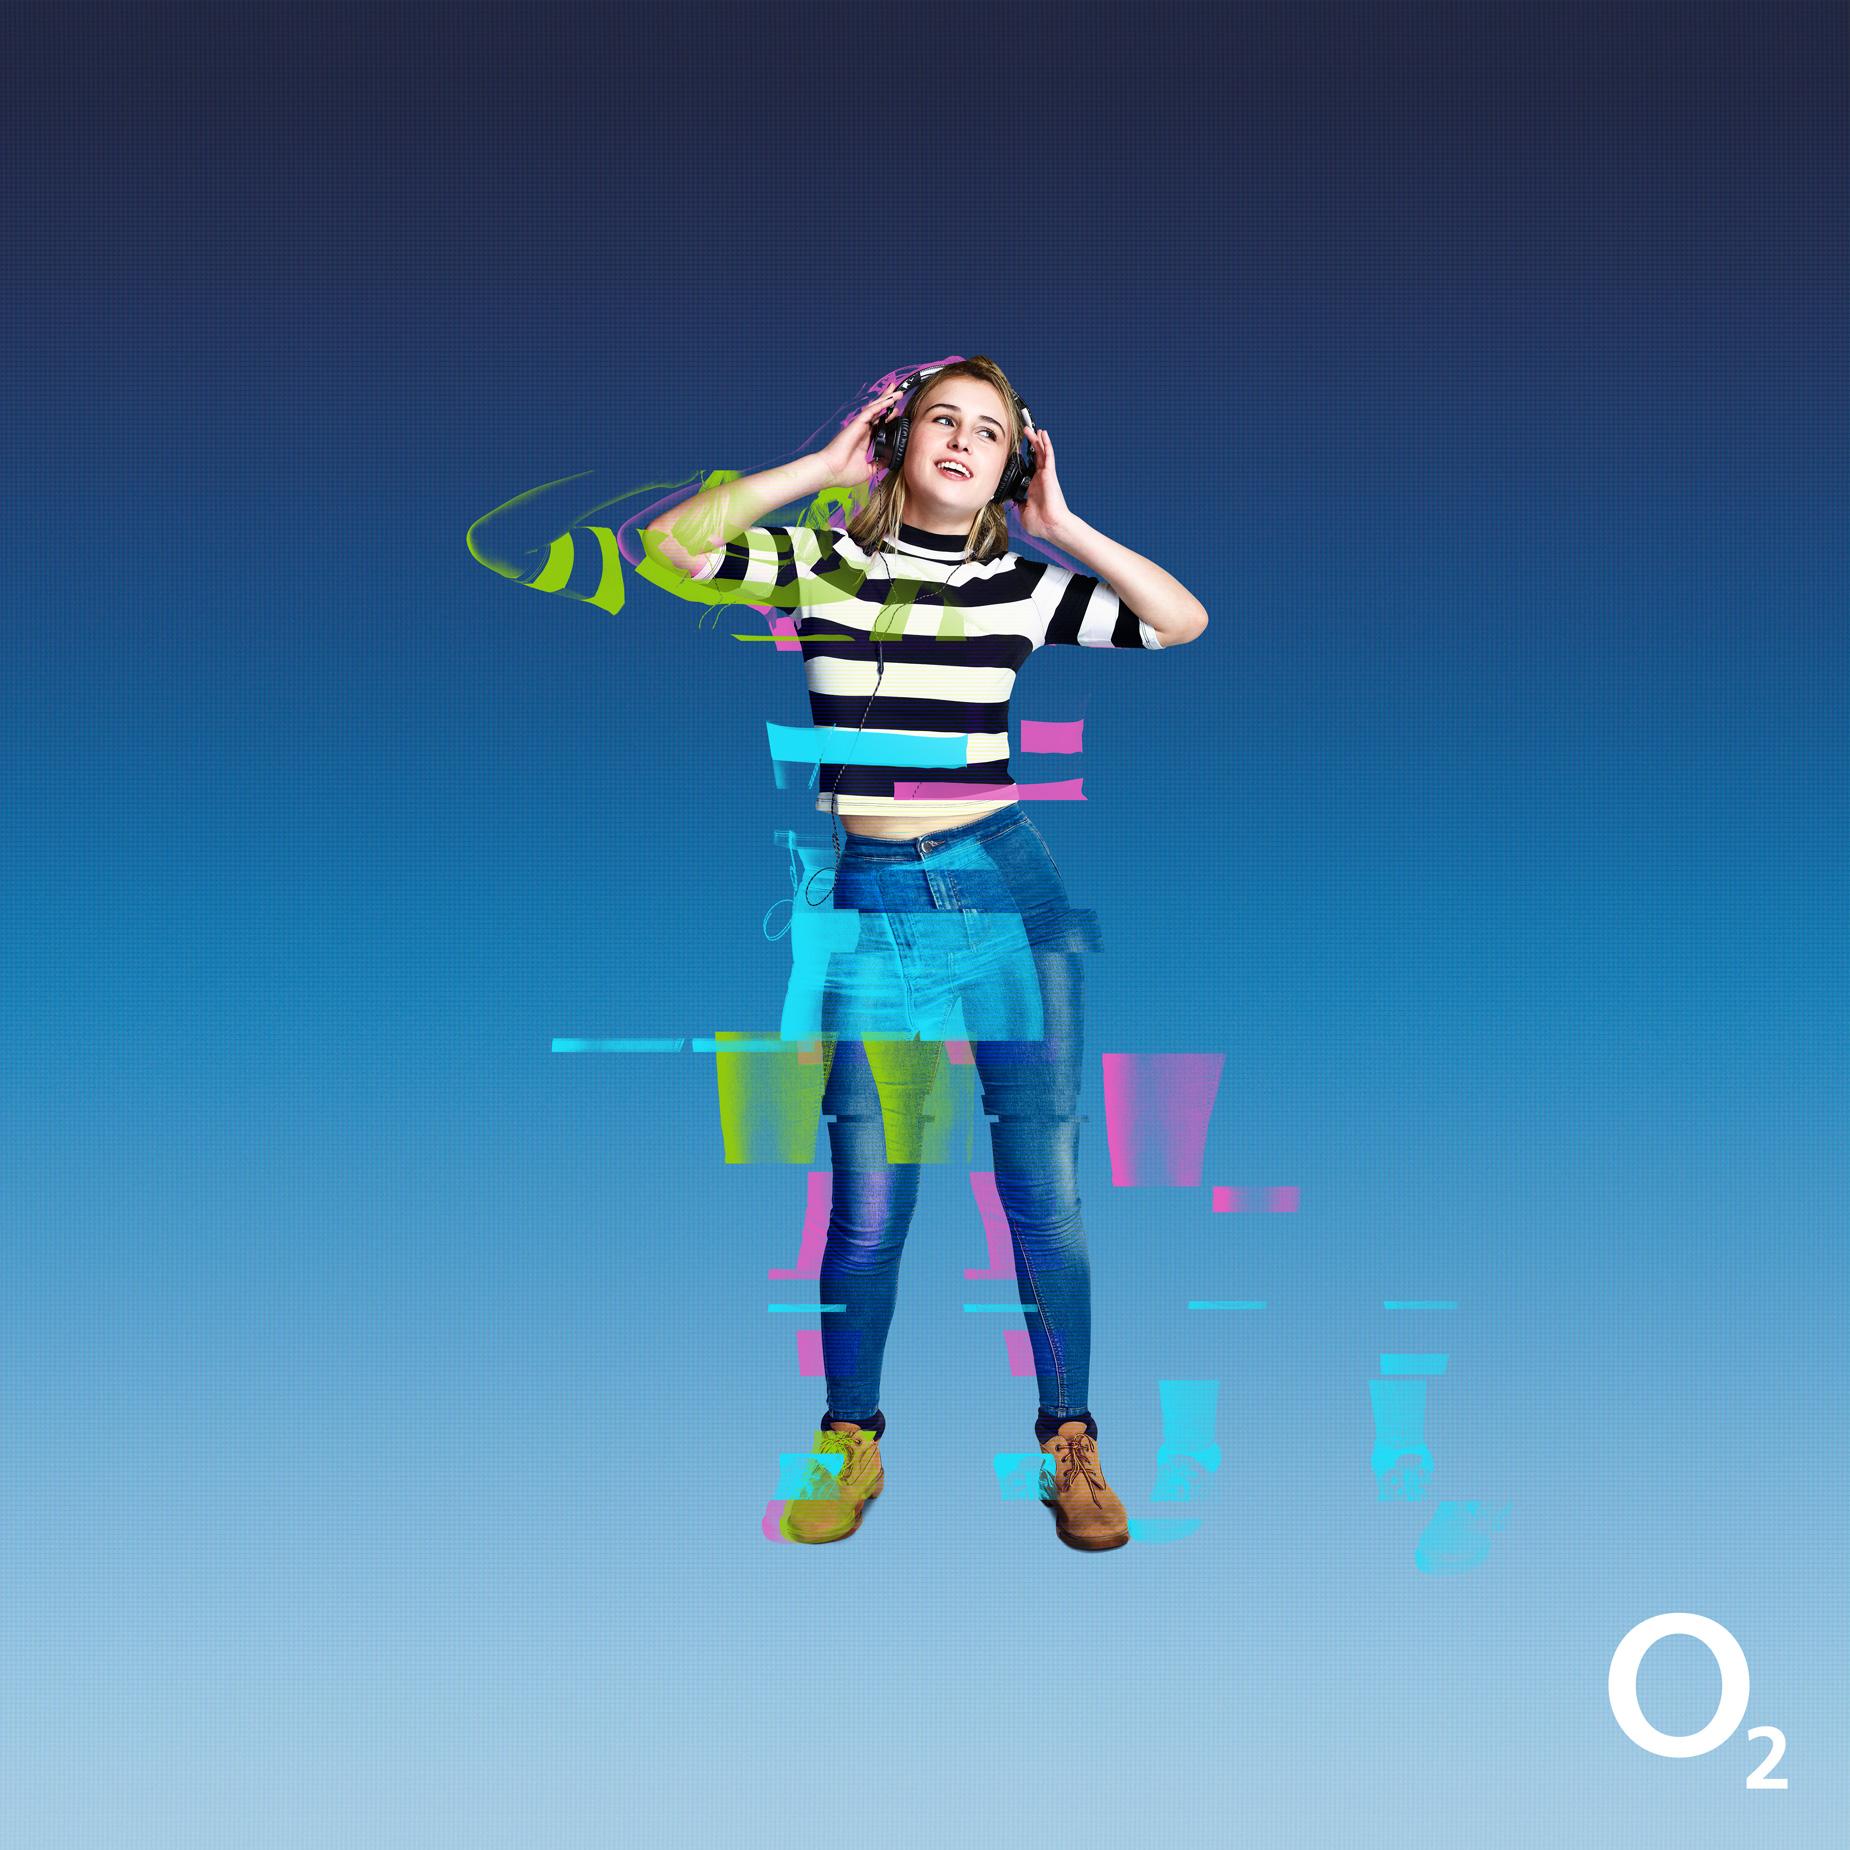 O2-Go-Think-Big-Chloe-Hine-4-Small-RGB